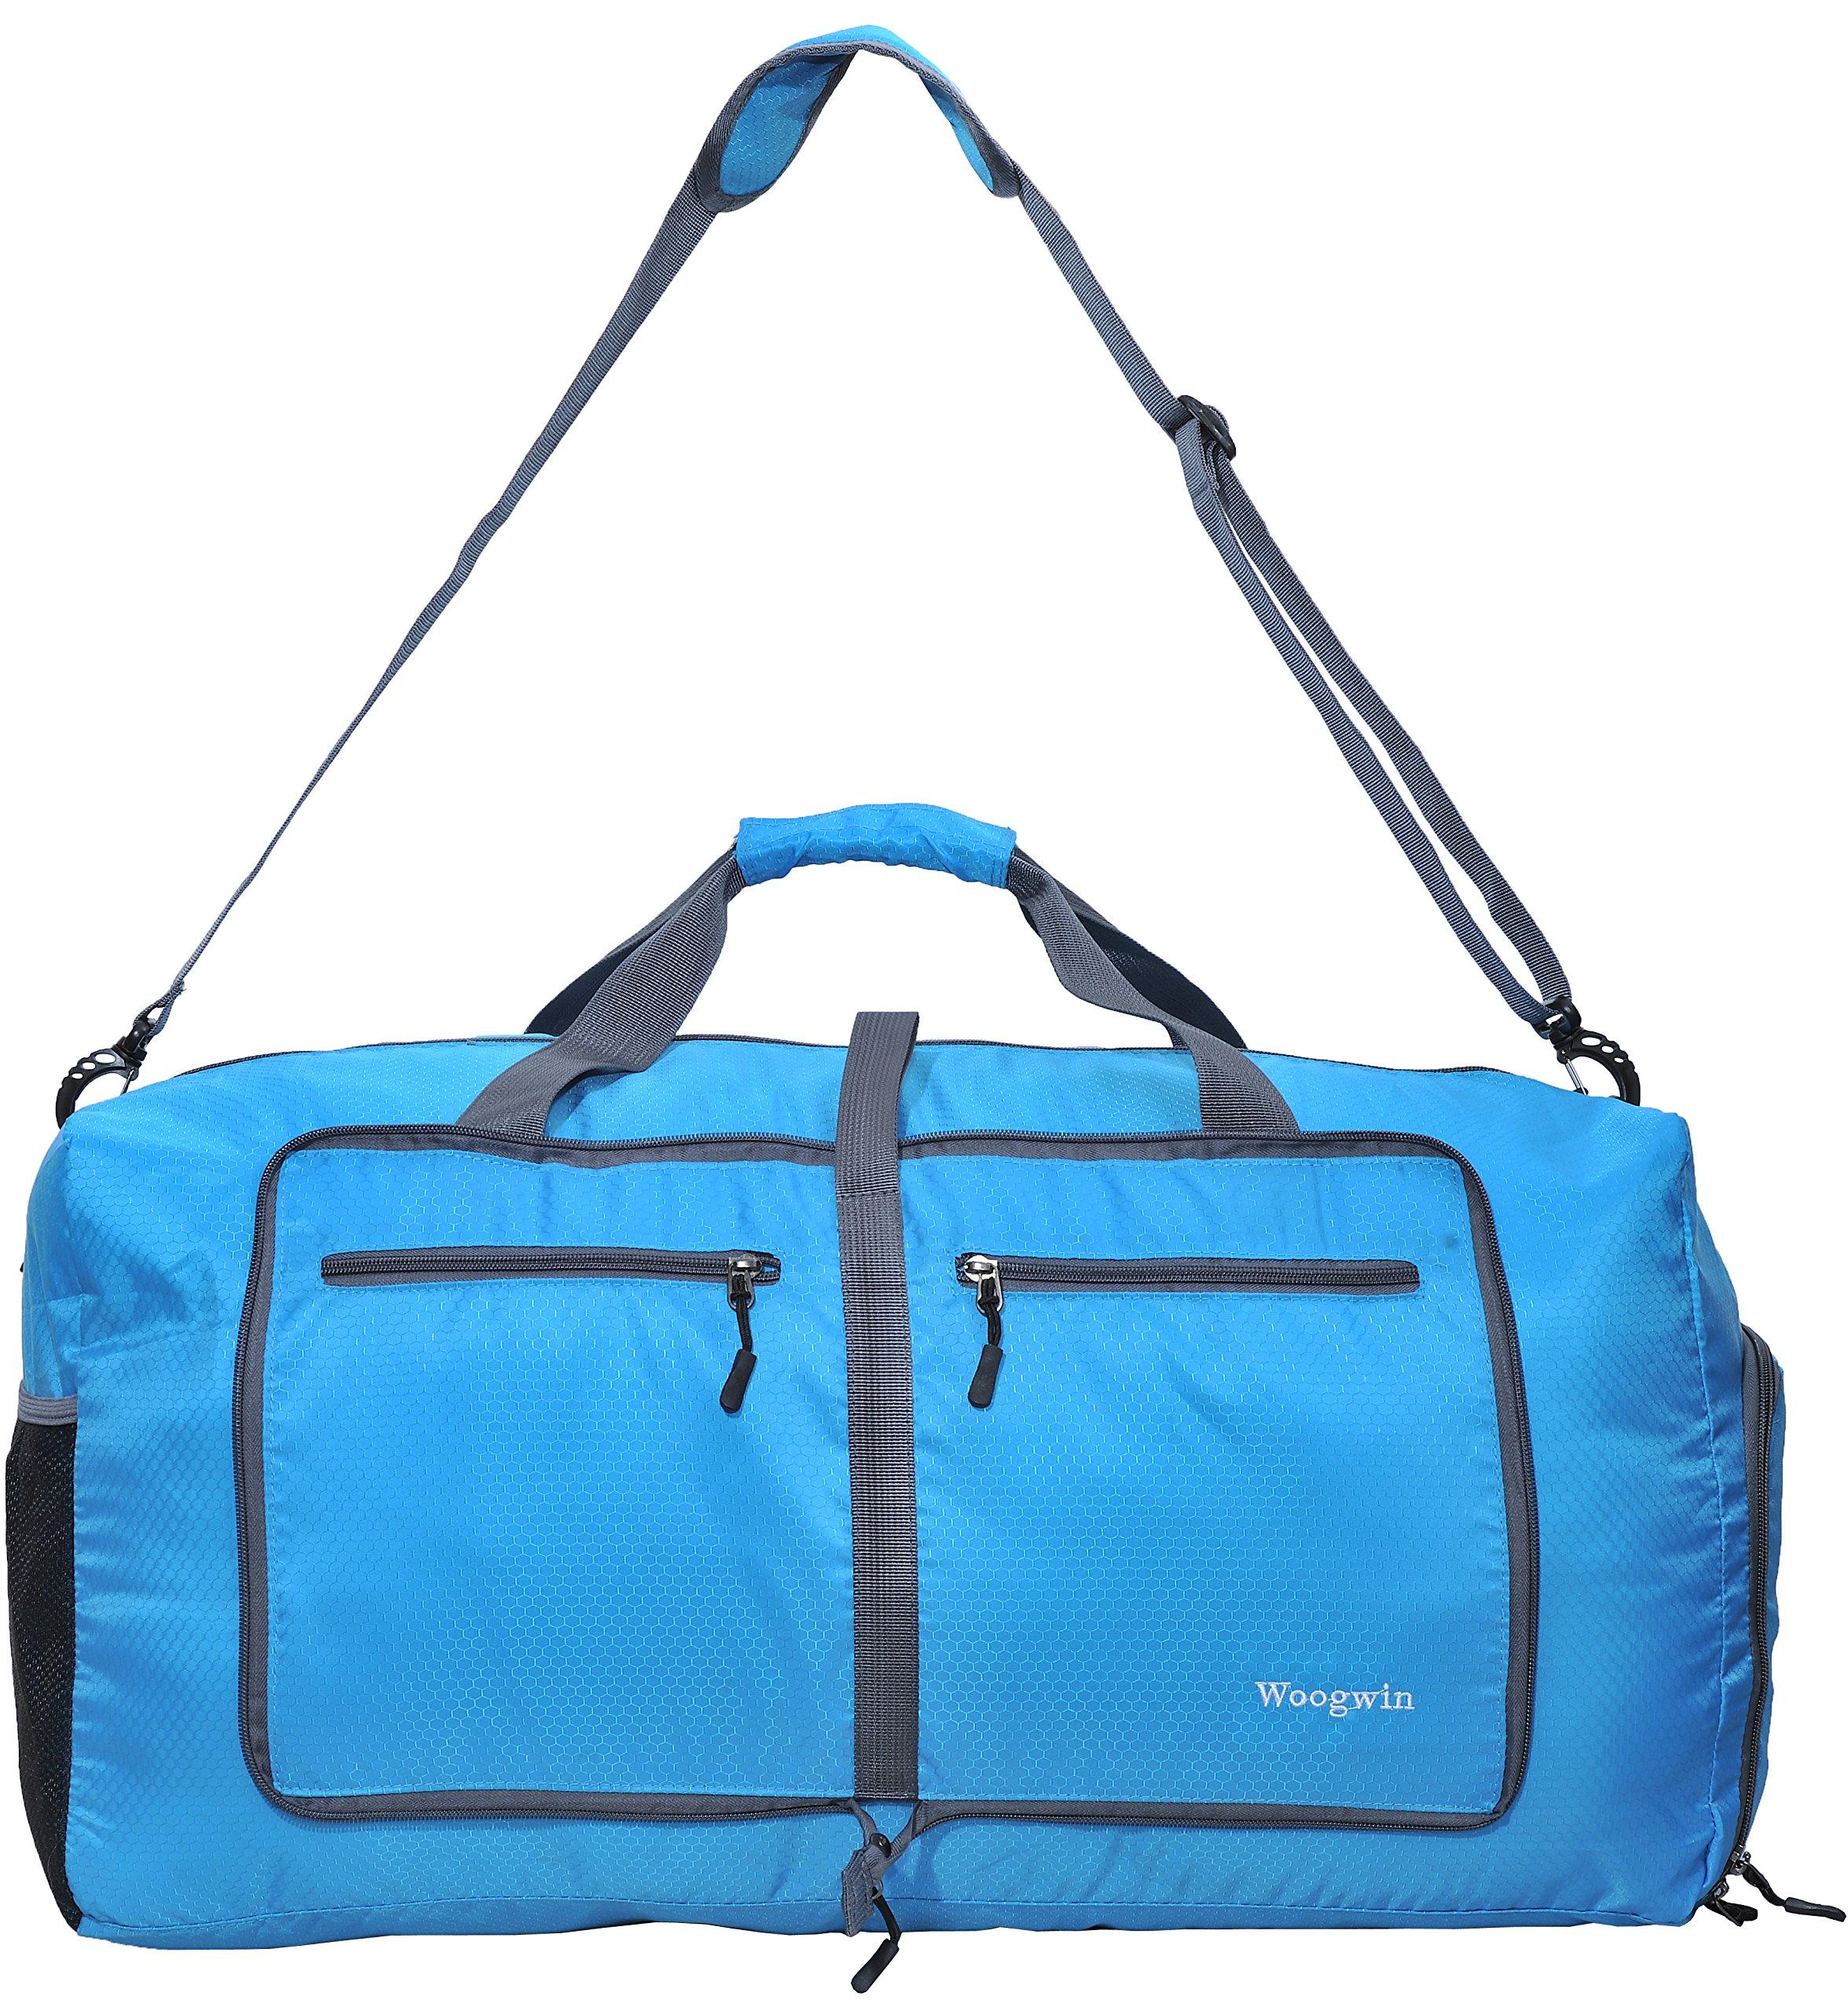 Woogwin Womens & Mens Travel Duffel Bag 60L Foldable Duffle Bags For Luggage Gym Sports (Blue)